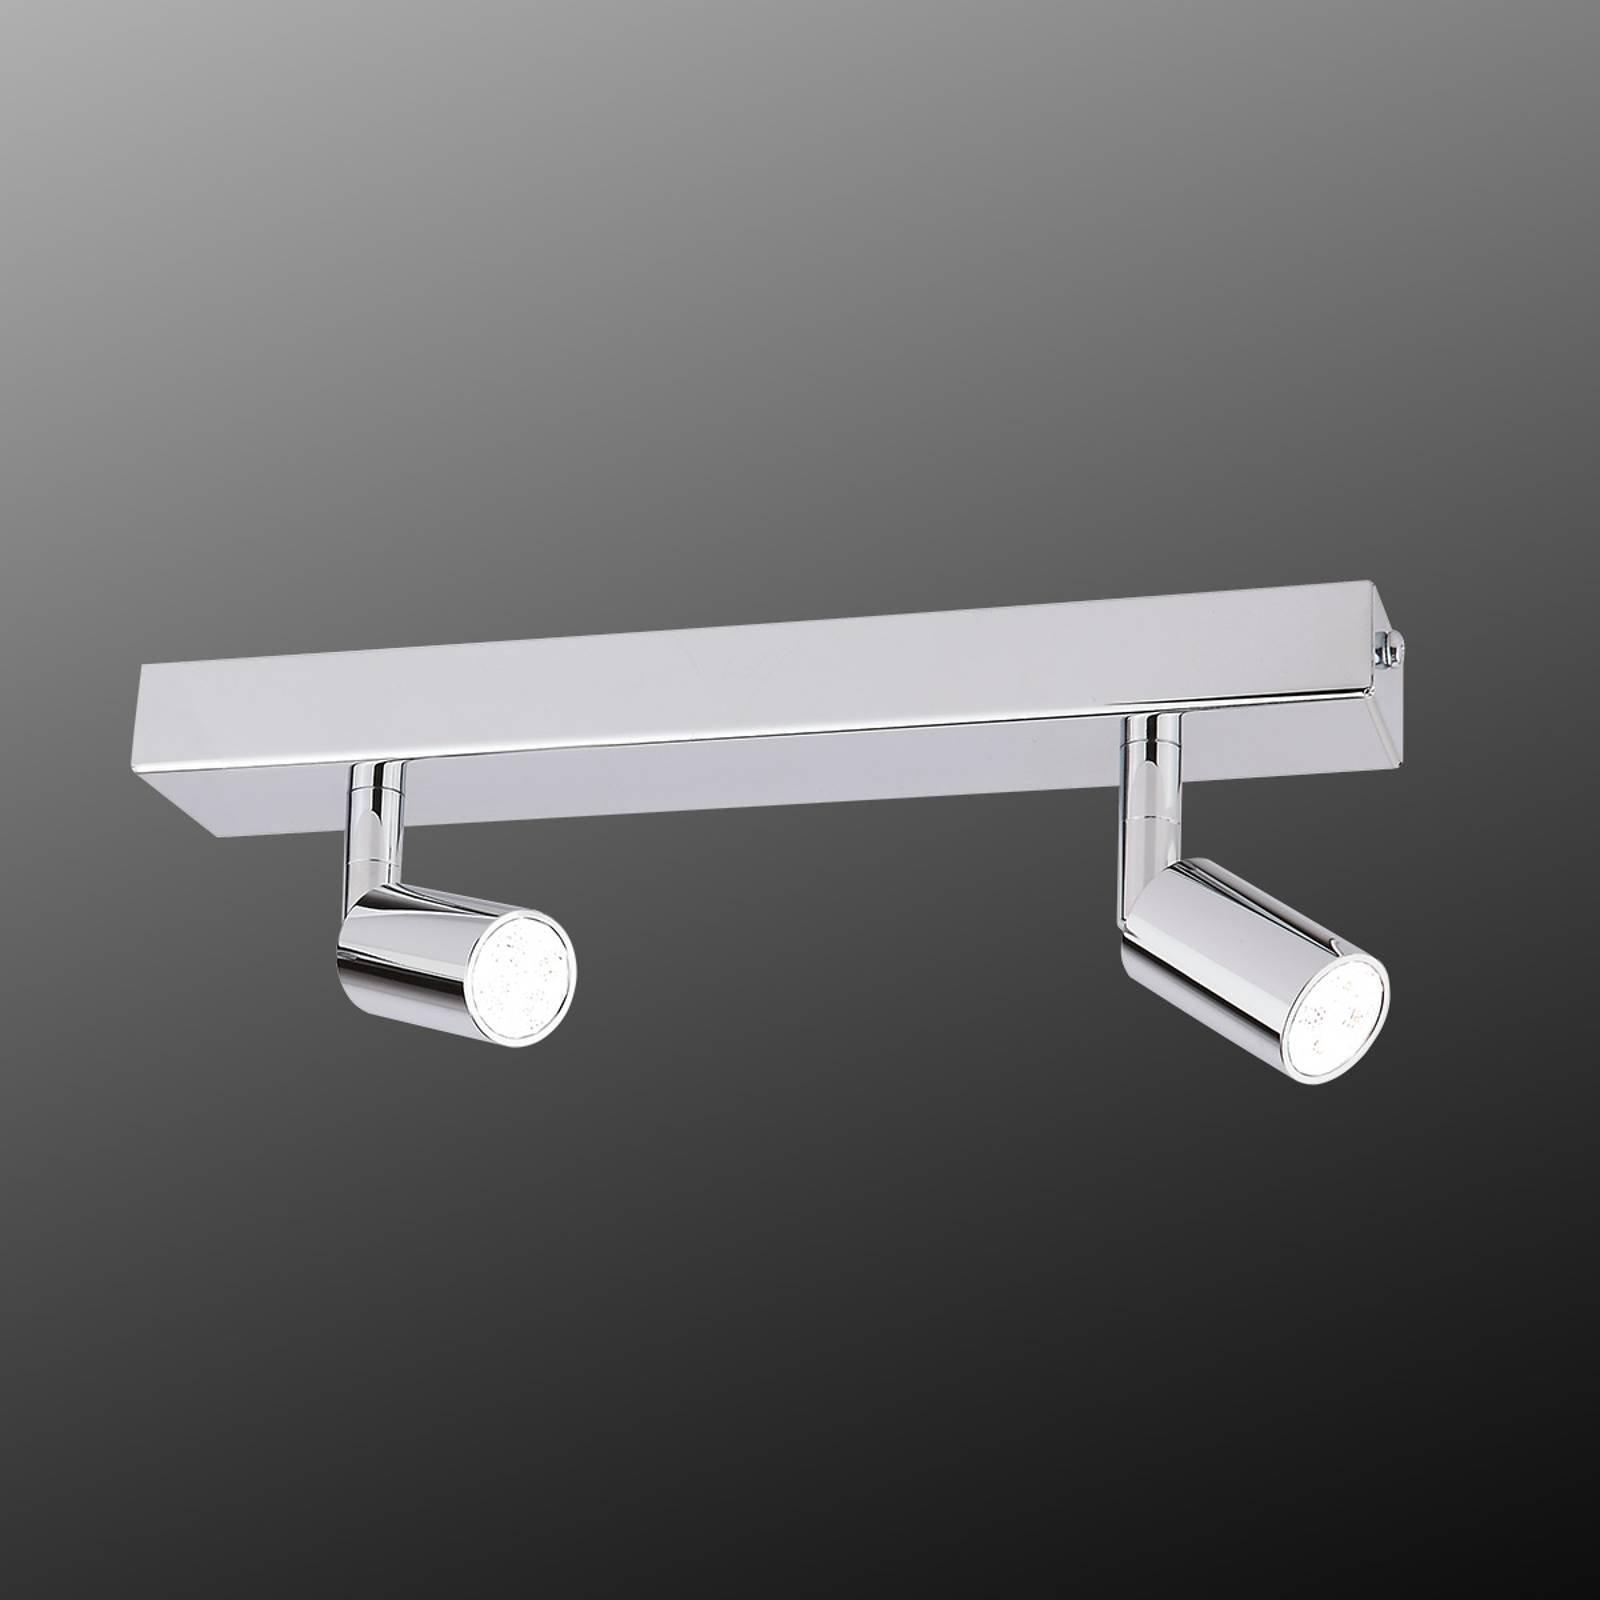 Moderne taklampe med LED-list og to lys